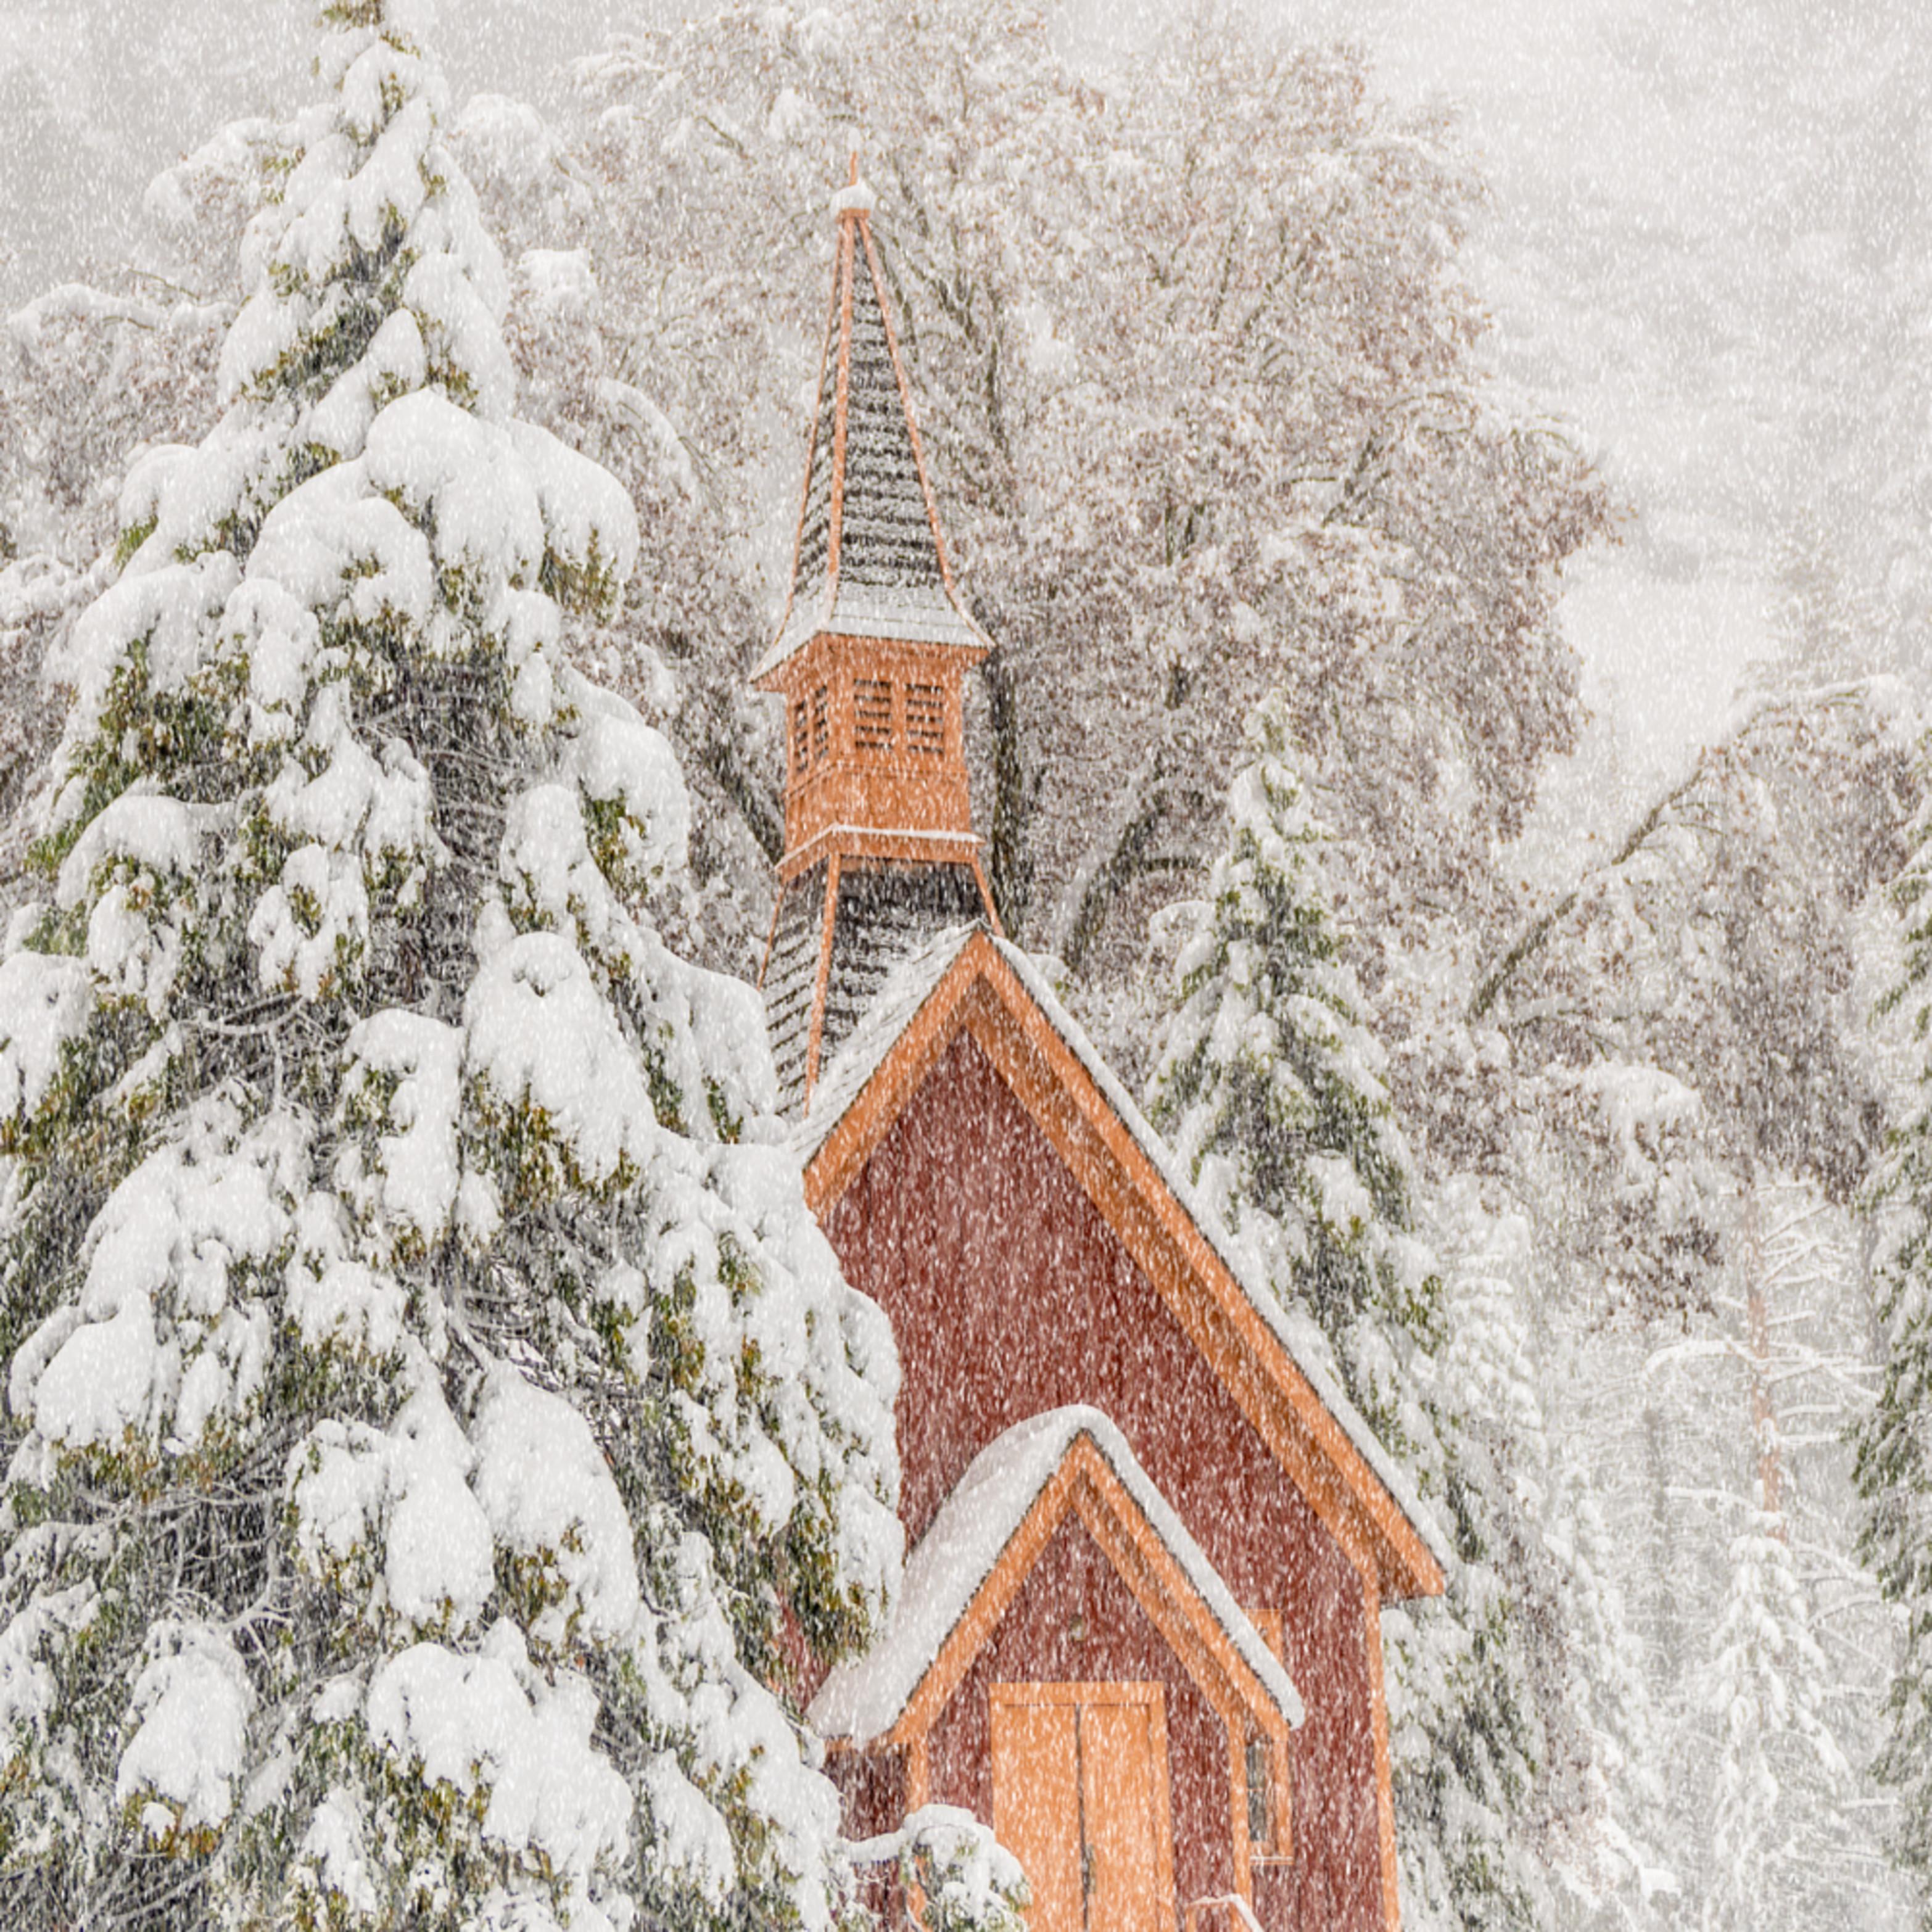 Yosemite chapel ivftfq